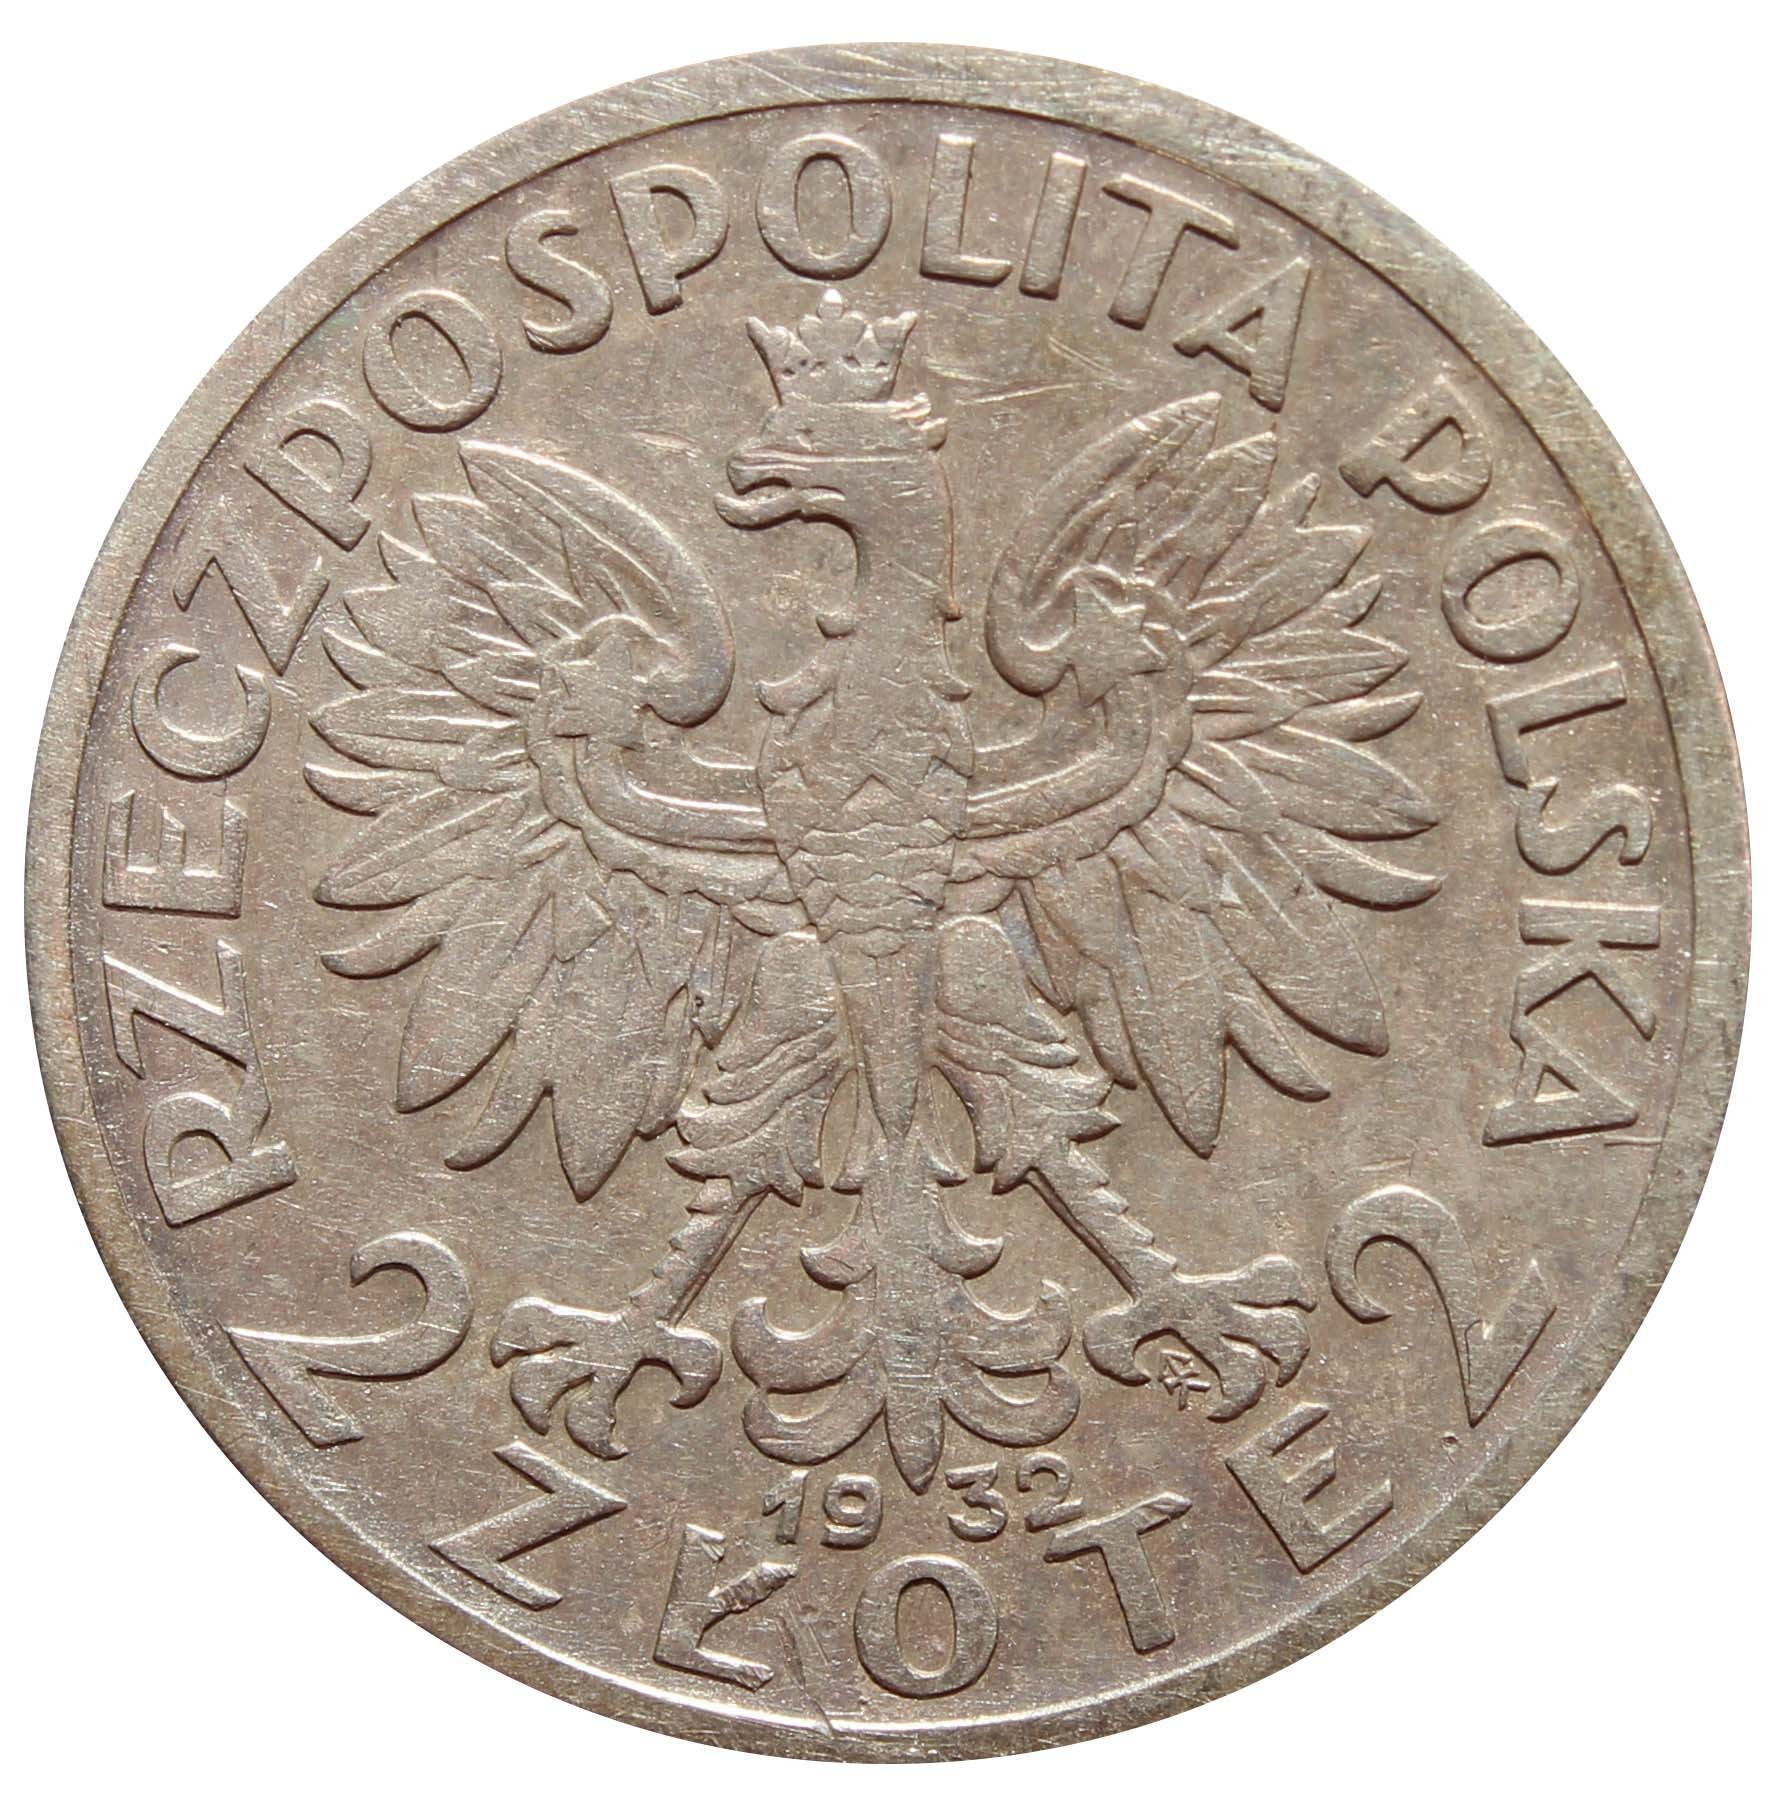 2 золотых. Ядвига. Польша. 1932 г. VF